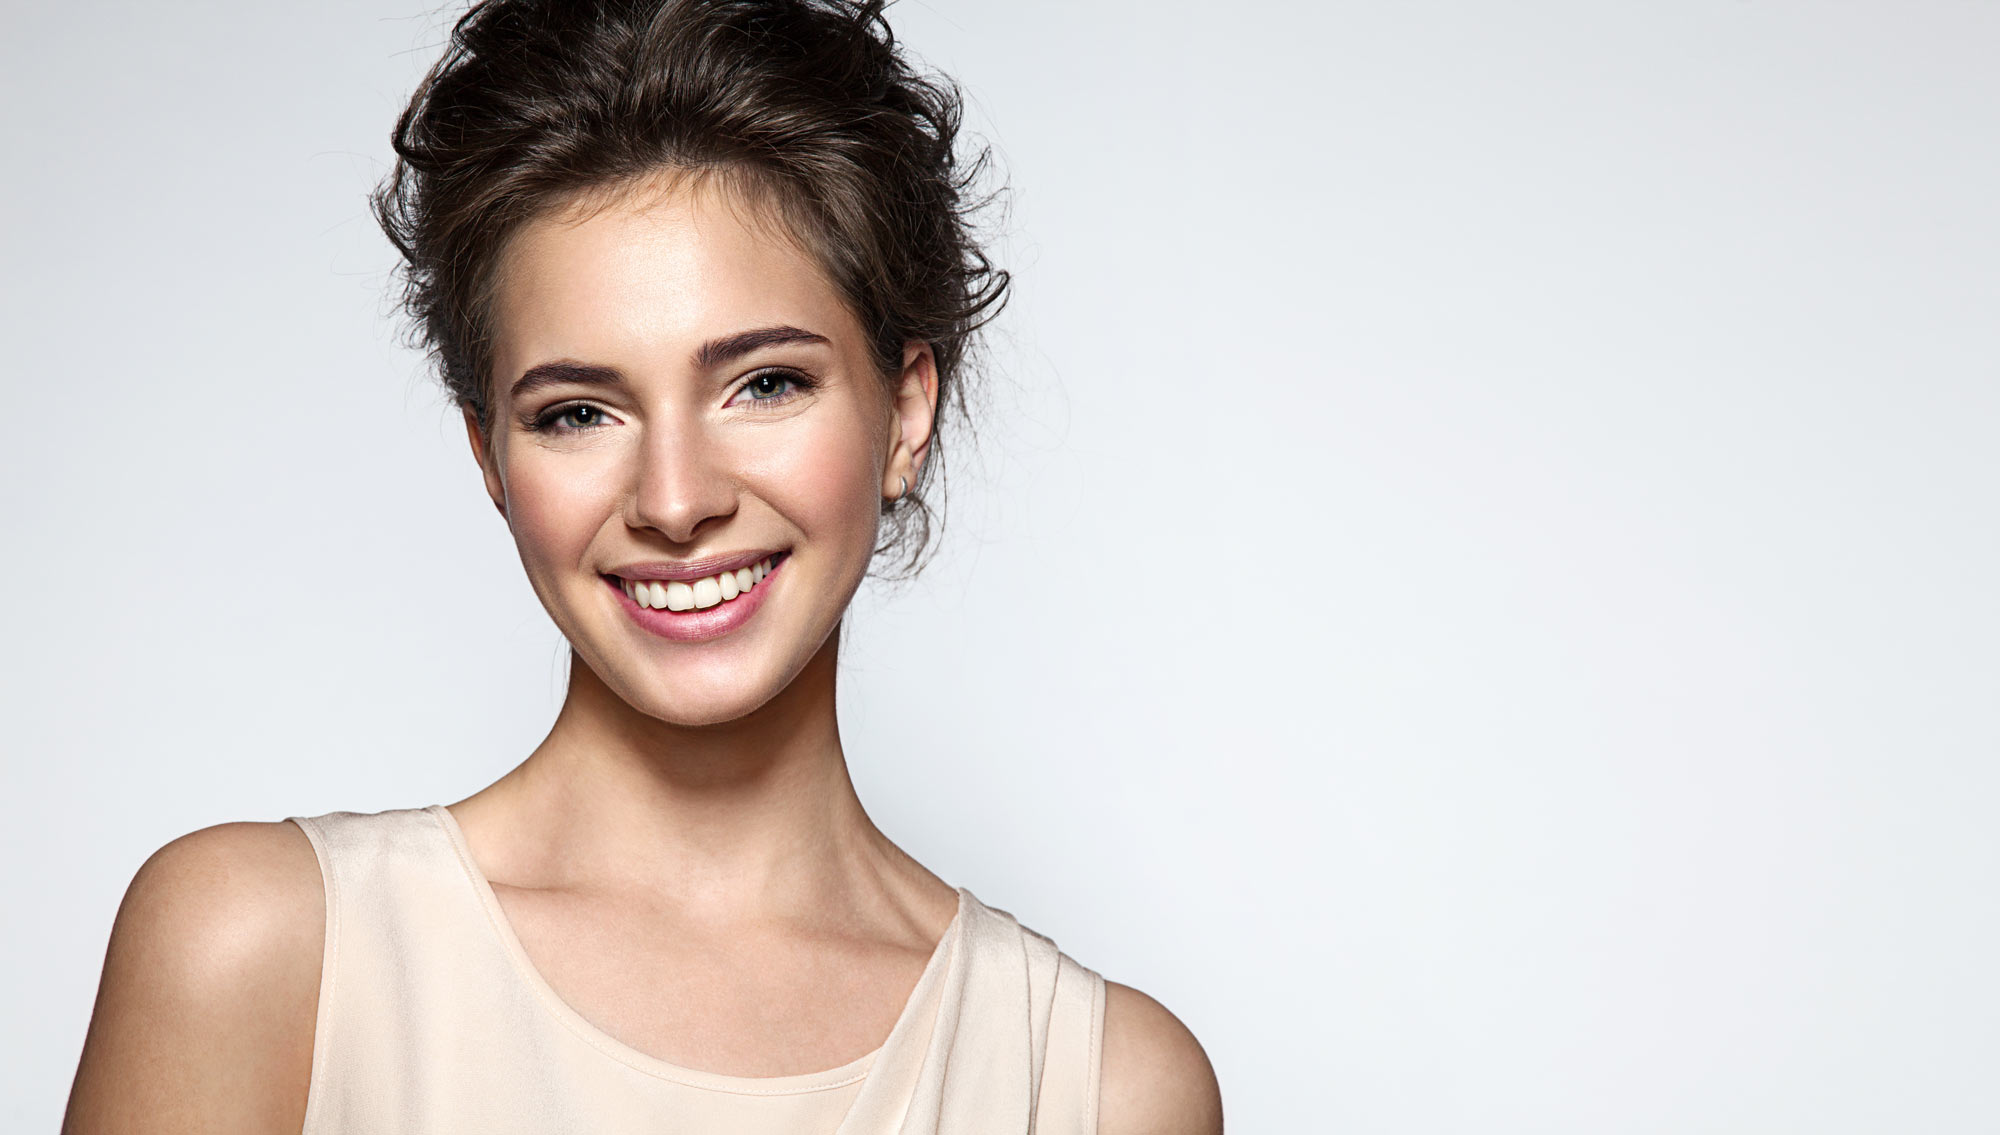 Woman Happy with MinimalScar